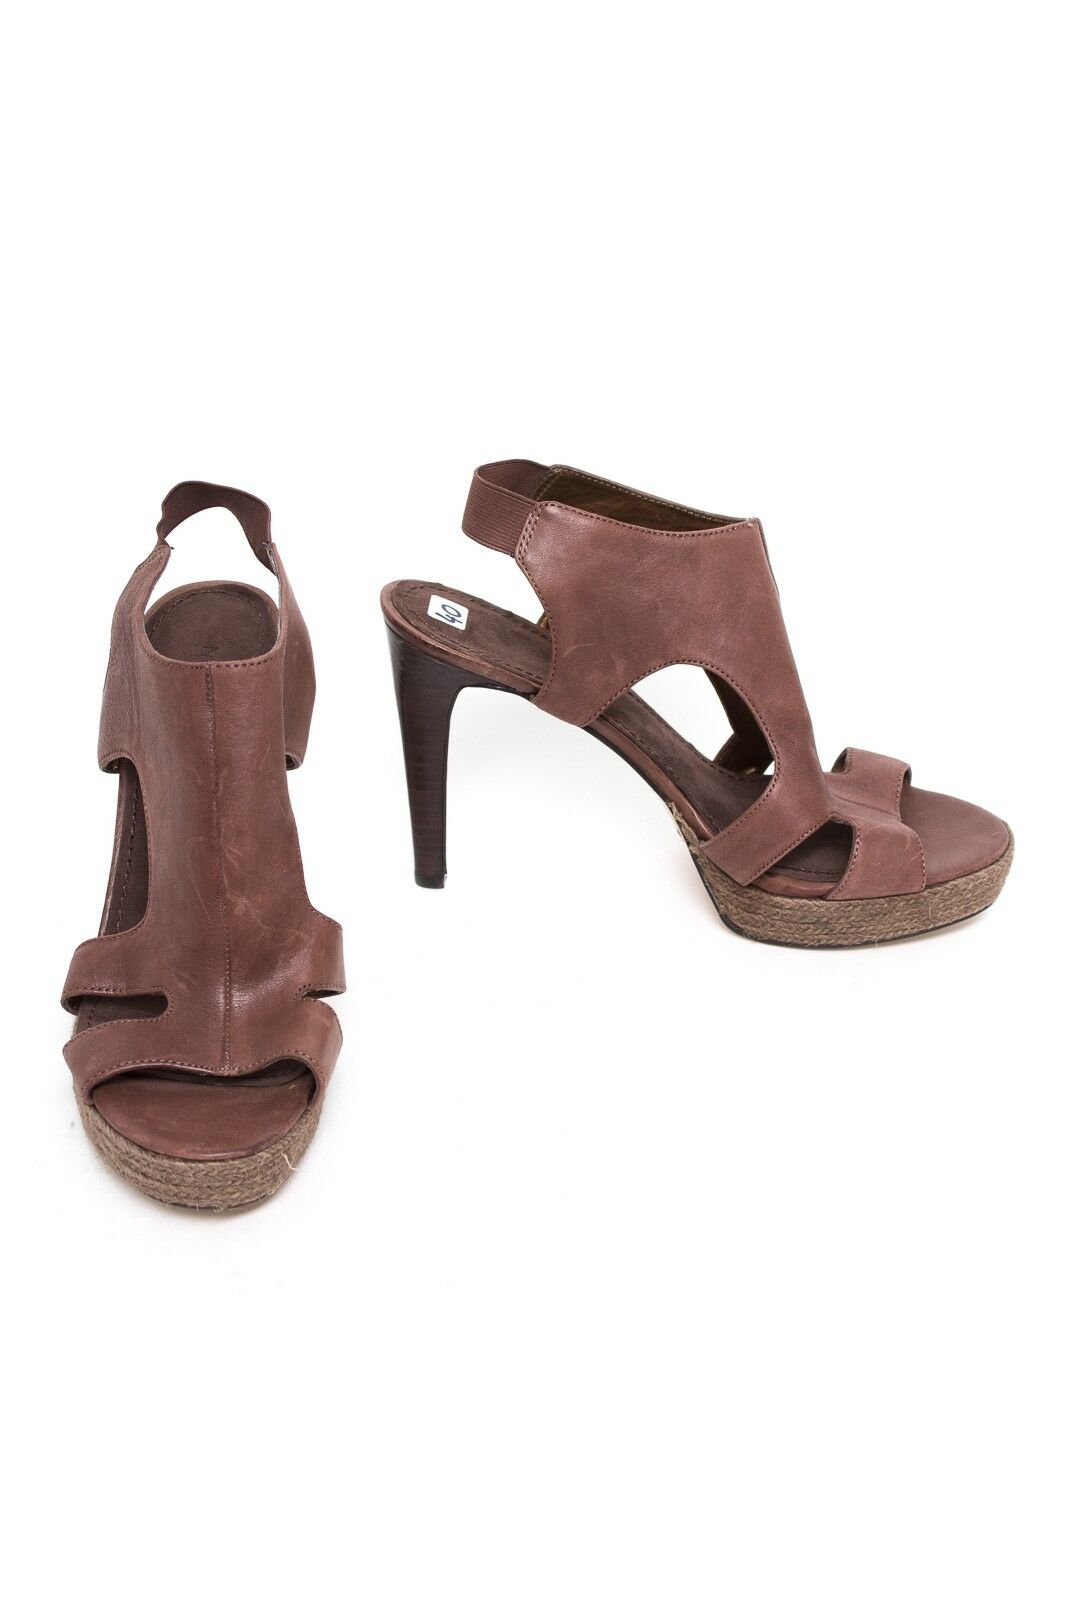 NINE WEST Sandalen Gr. EU 40 Damen Schuhe Pumps Pumps Pumps High Heels Leder c44e53